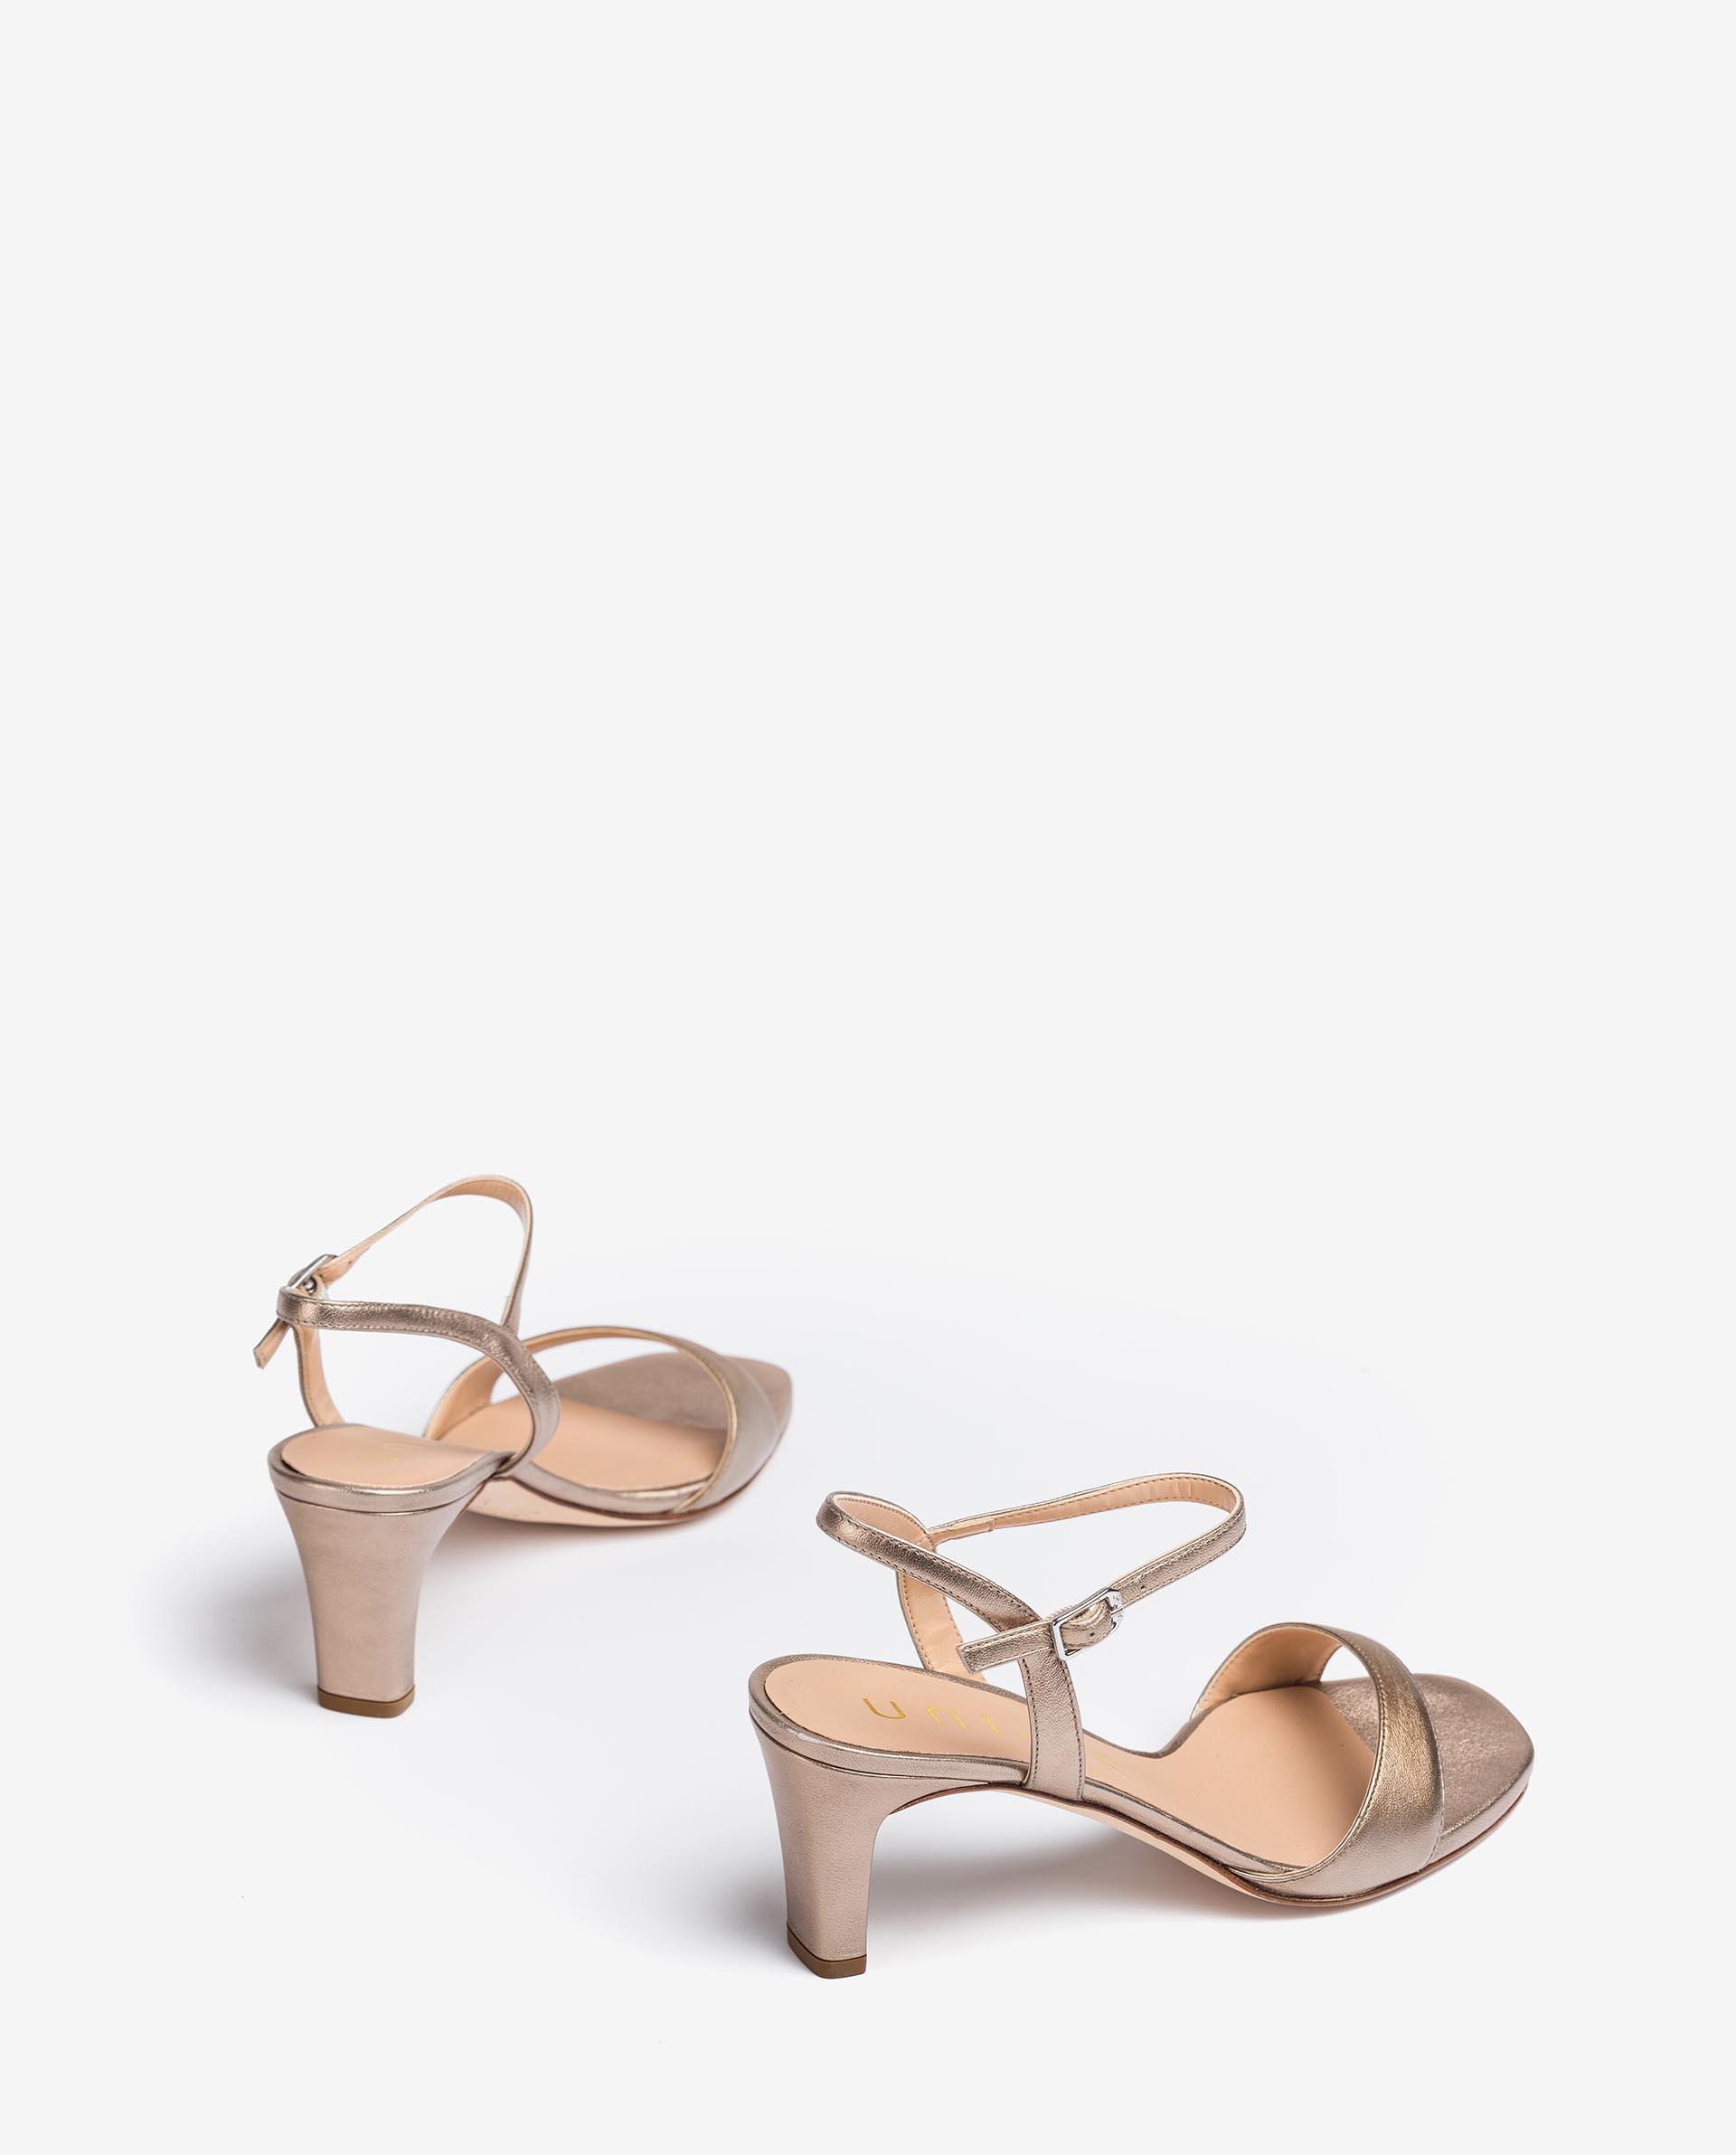 UNISA Metal effect leather sandals MECHI_21_LMT 2